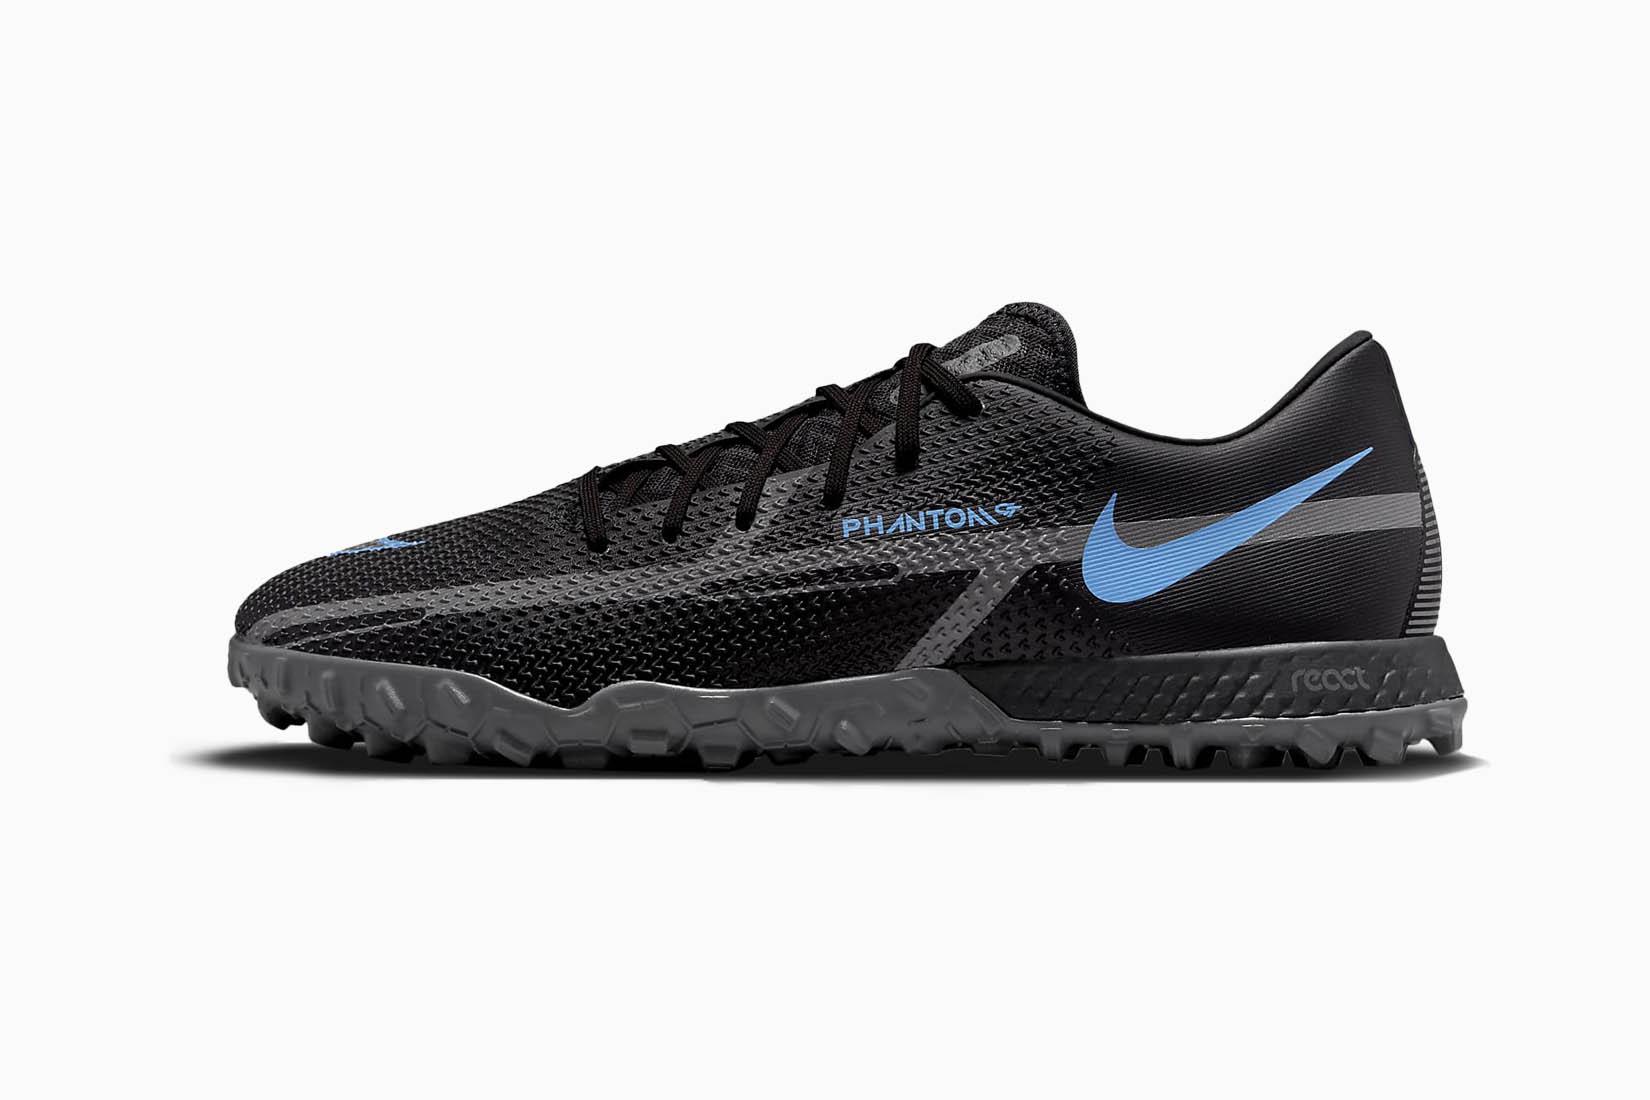 best nike running shoes men nike phantom gt2 pro tf review Luxe Digital